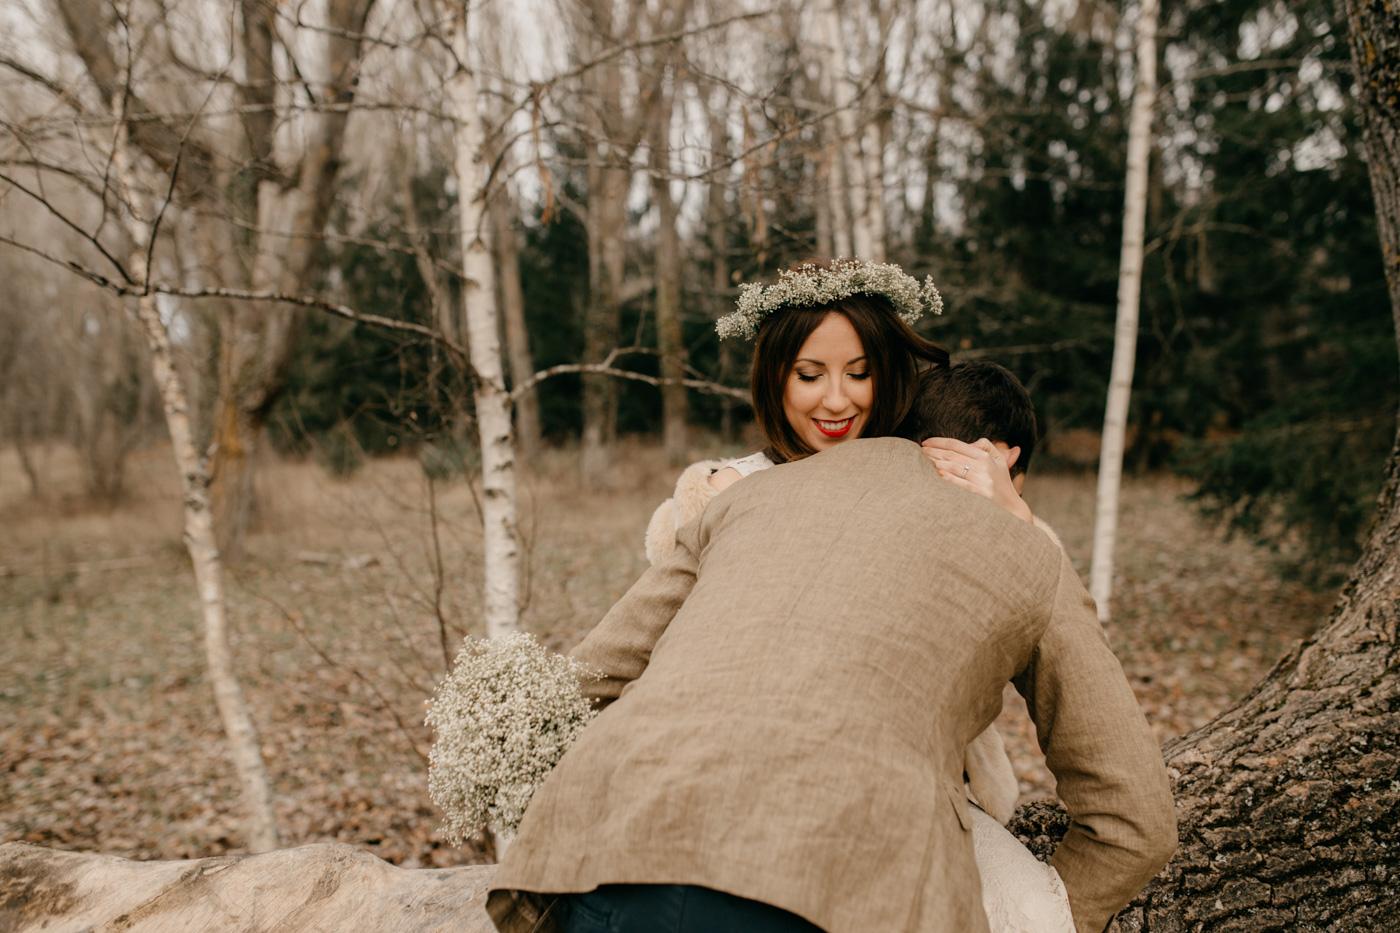 Velvet-Hush-fotografos-boda-al-aire-libre-madrid-105